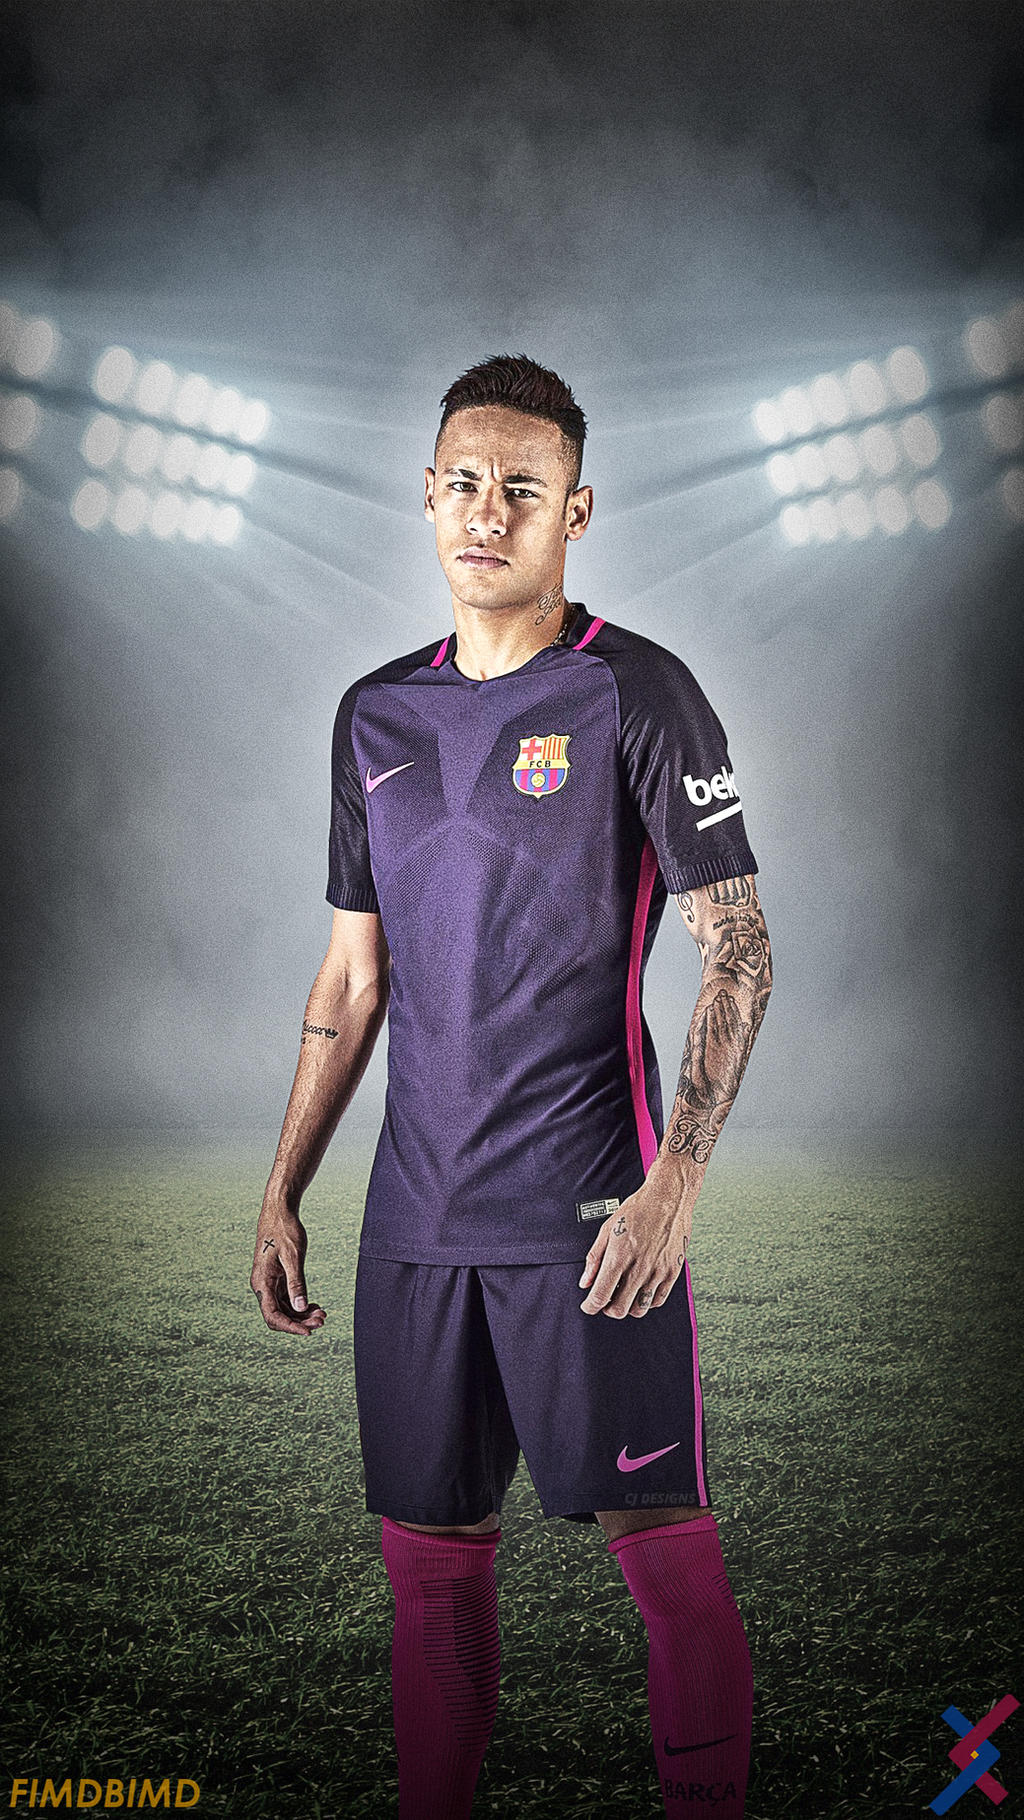 Group Of Neymar Jr Wallpaper 2017